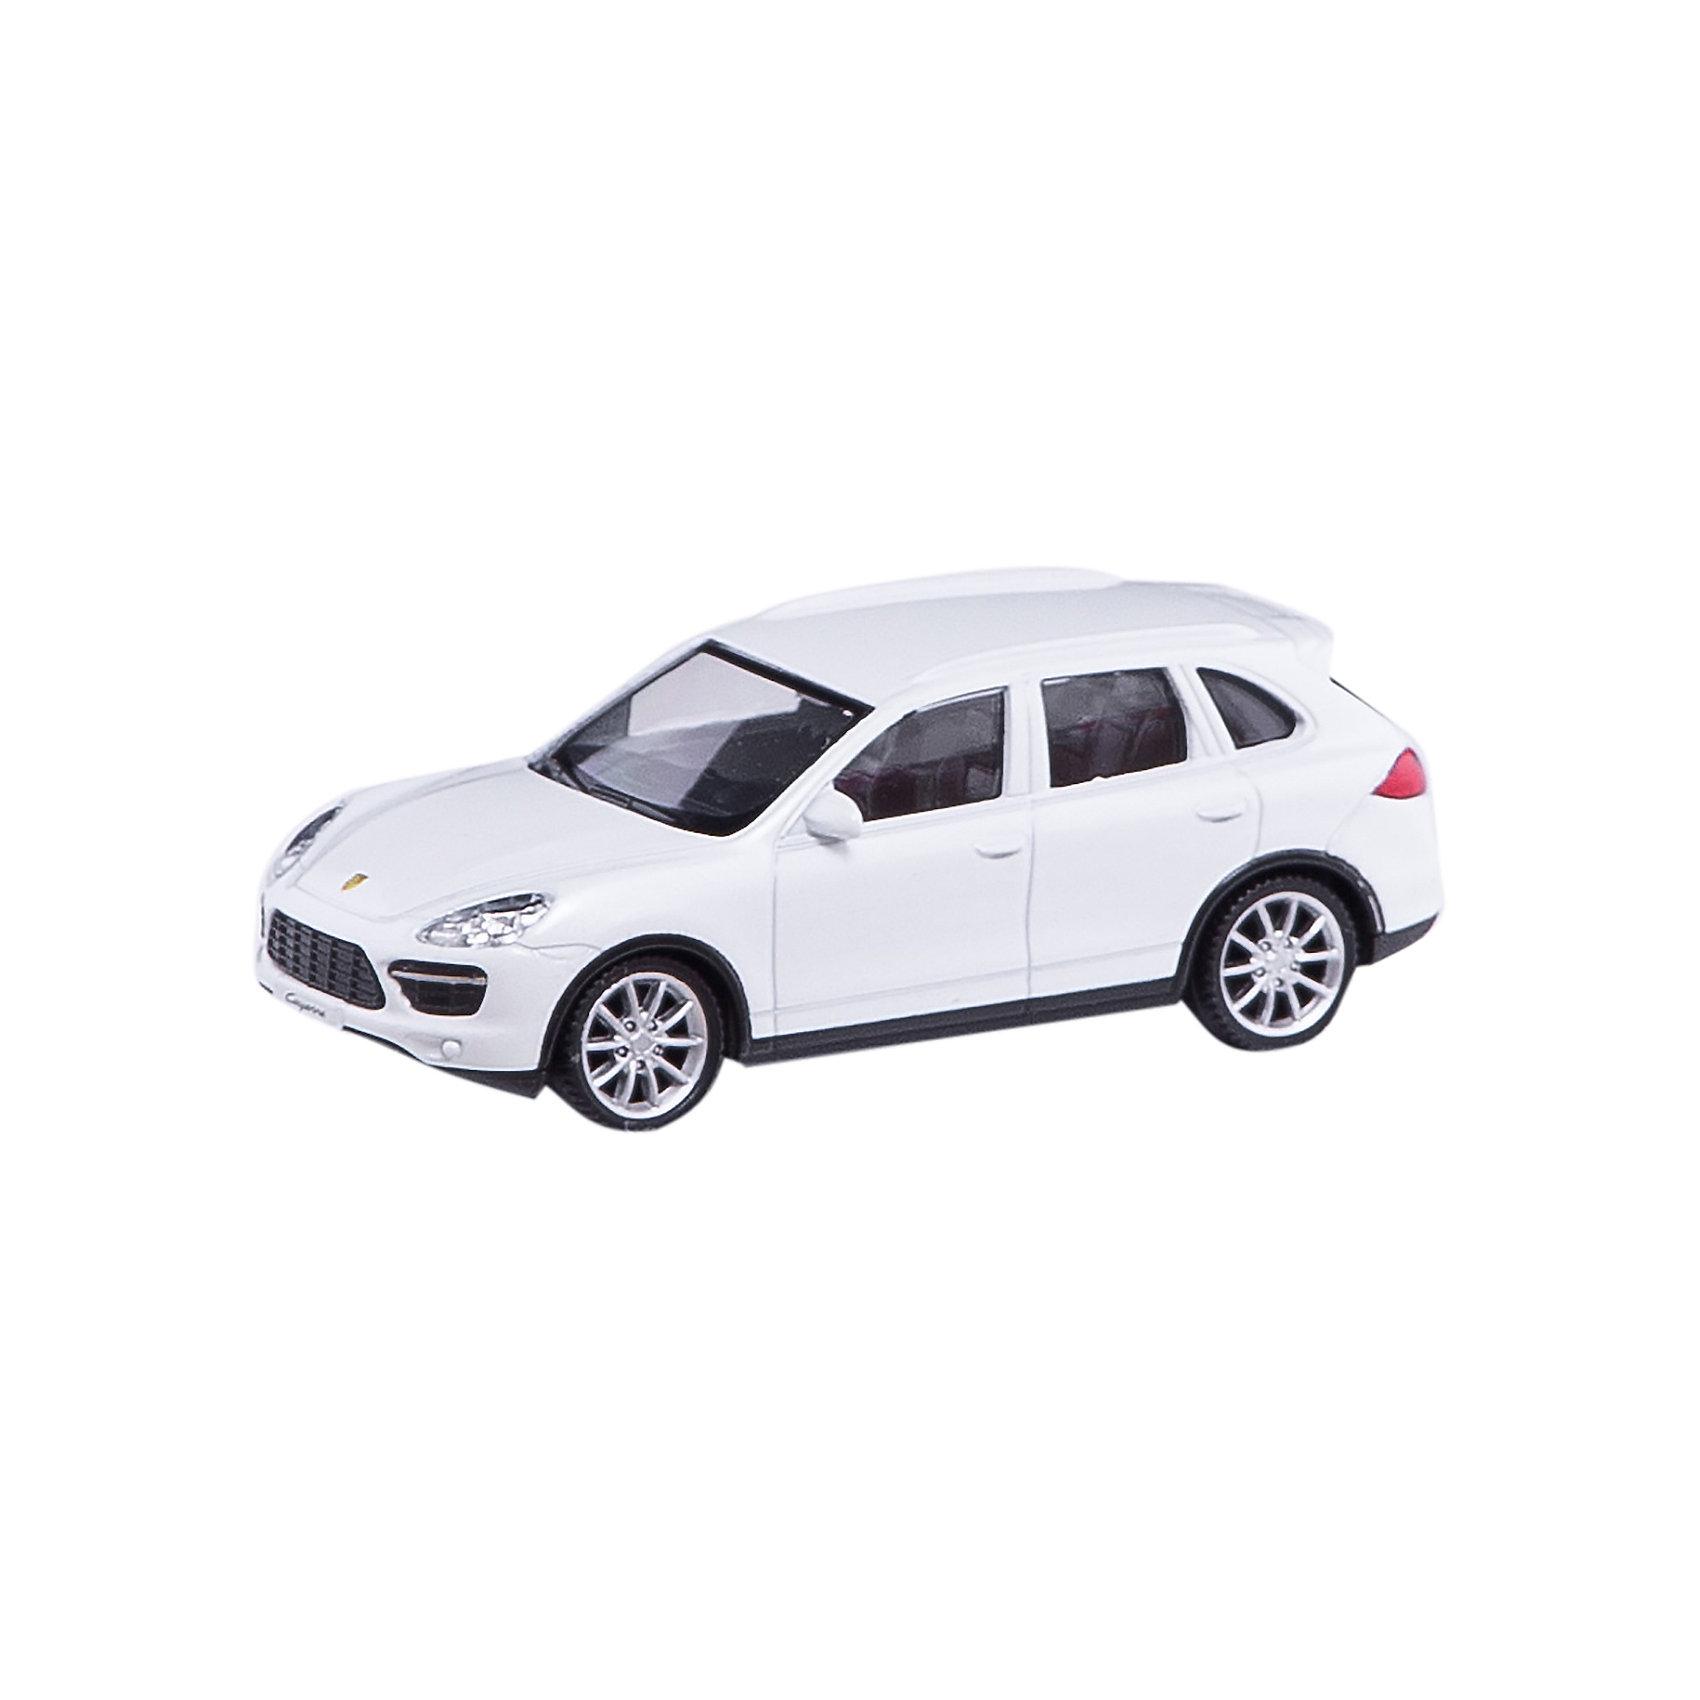 Машинка Porsche Cayenne Turbo 4, AutotimeМашинки<br><br><br>Ширина мм: 165<br>Глубина мм: 57<br>Высота мм: 75<br>Вес г: 13<br>Возраст от месяцев: 36<br>Возраст до месяцев: 2147483647<br>Пол: Мужской<br>Возраст: Детский<br>SKU: 5584093